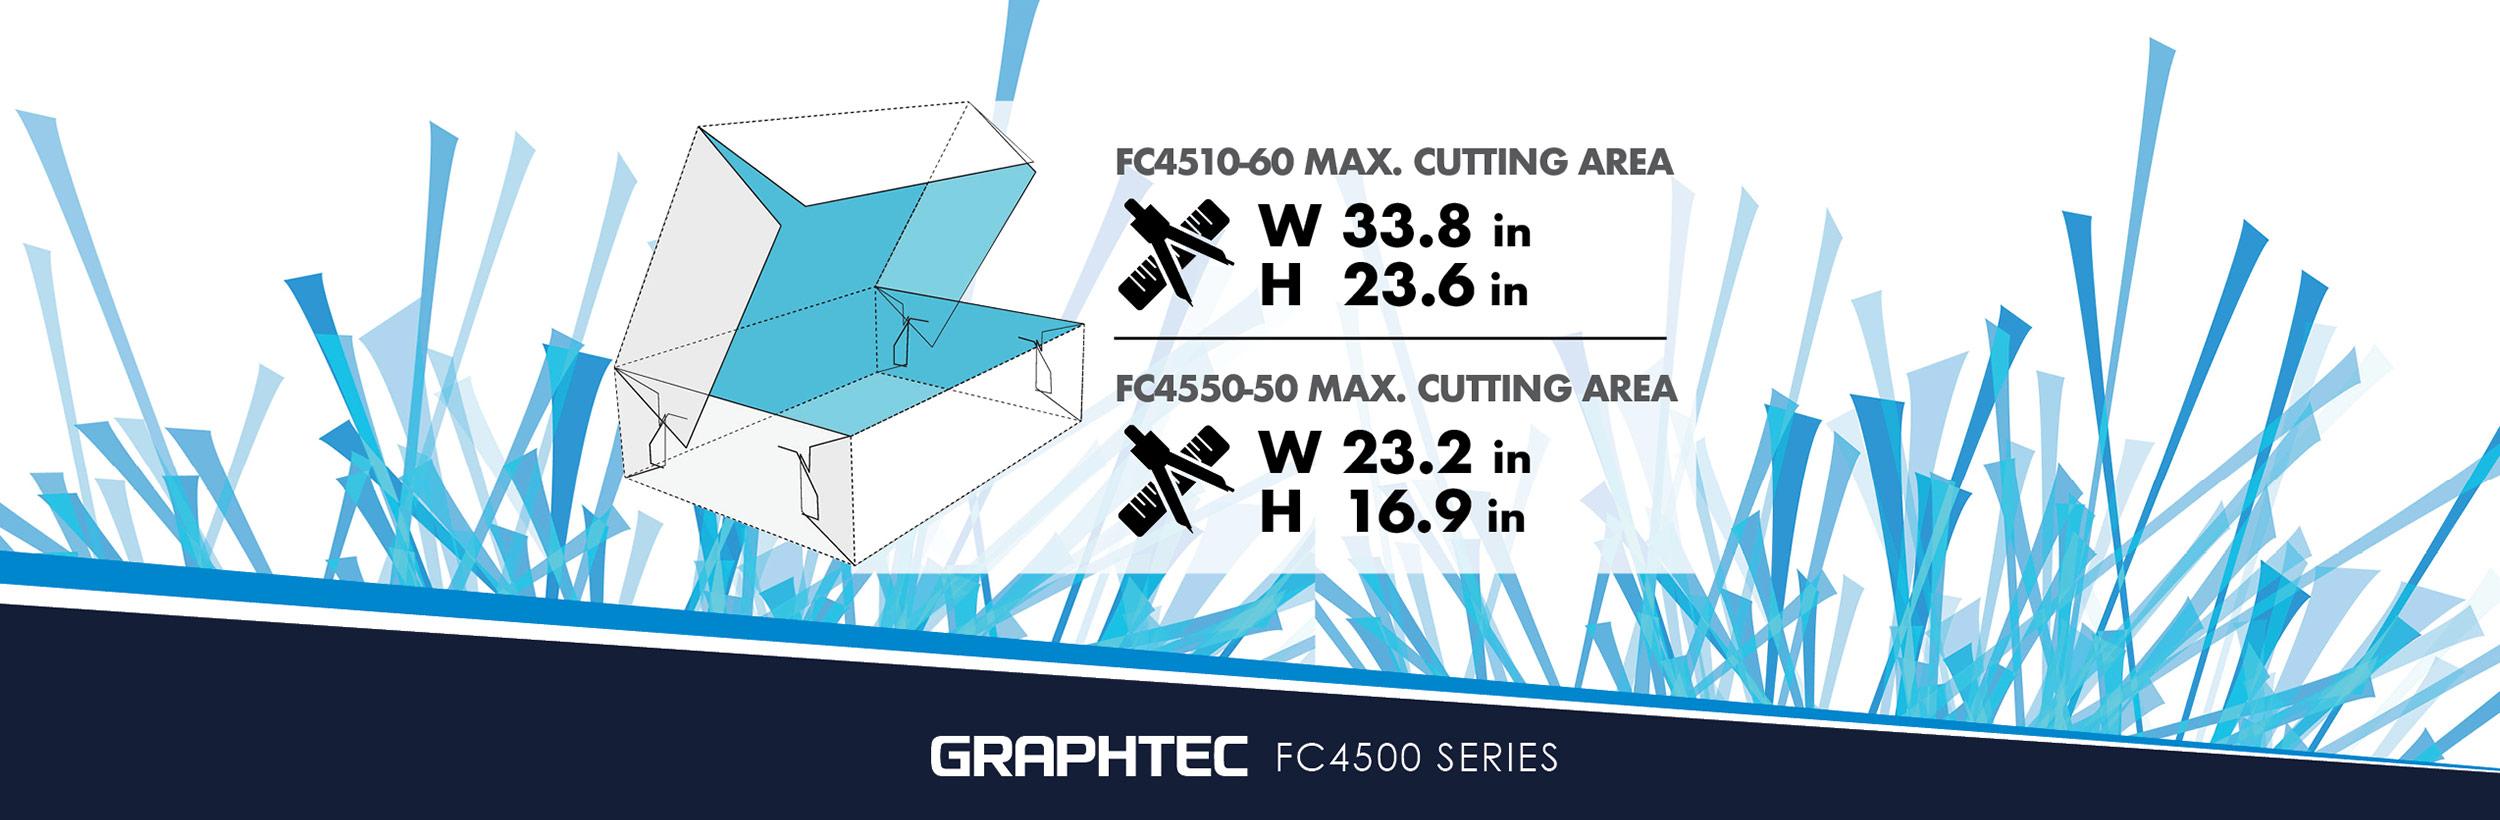 Vinyl+Cutter+Flatbed-Cutter+Package-Cutter-Machine+Graphtec+FC4500-Series-High-Quality-2-Cutting-Area-Sizes.jpg